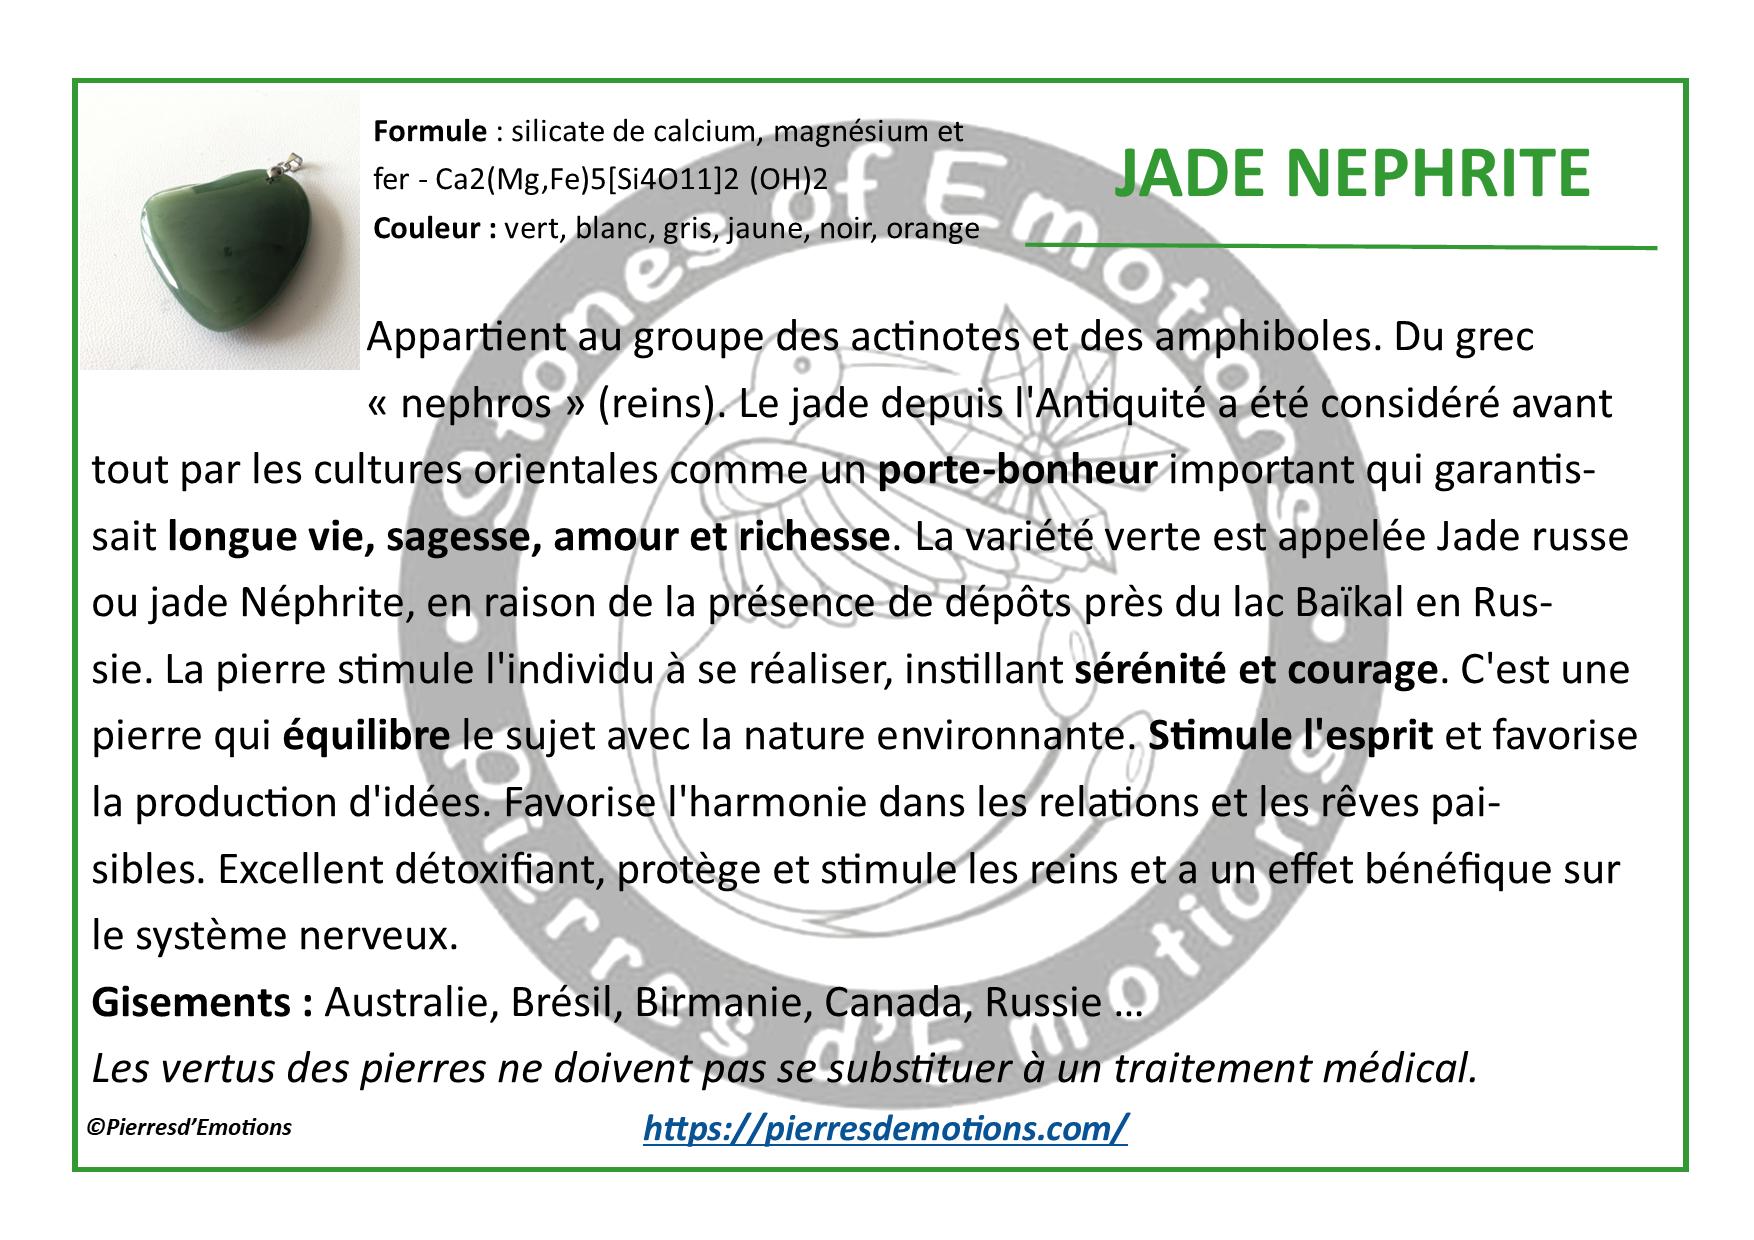 JadeNephrite